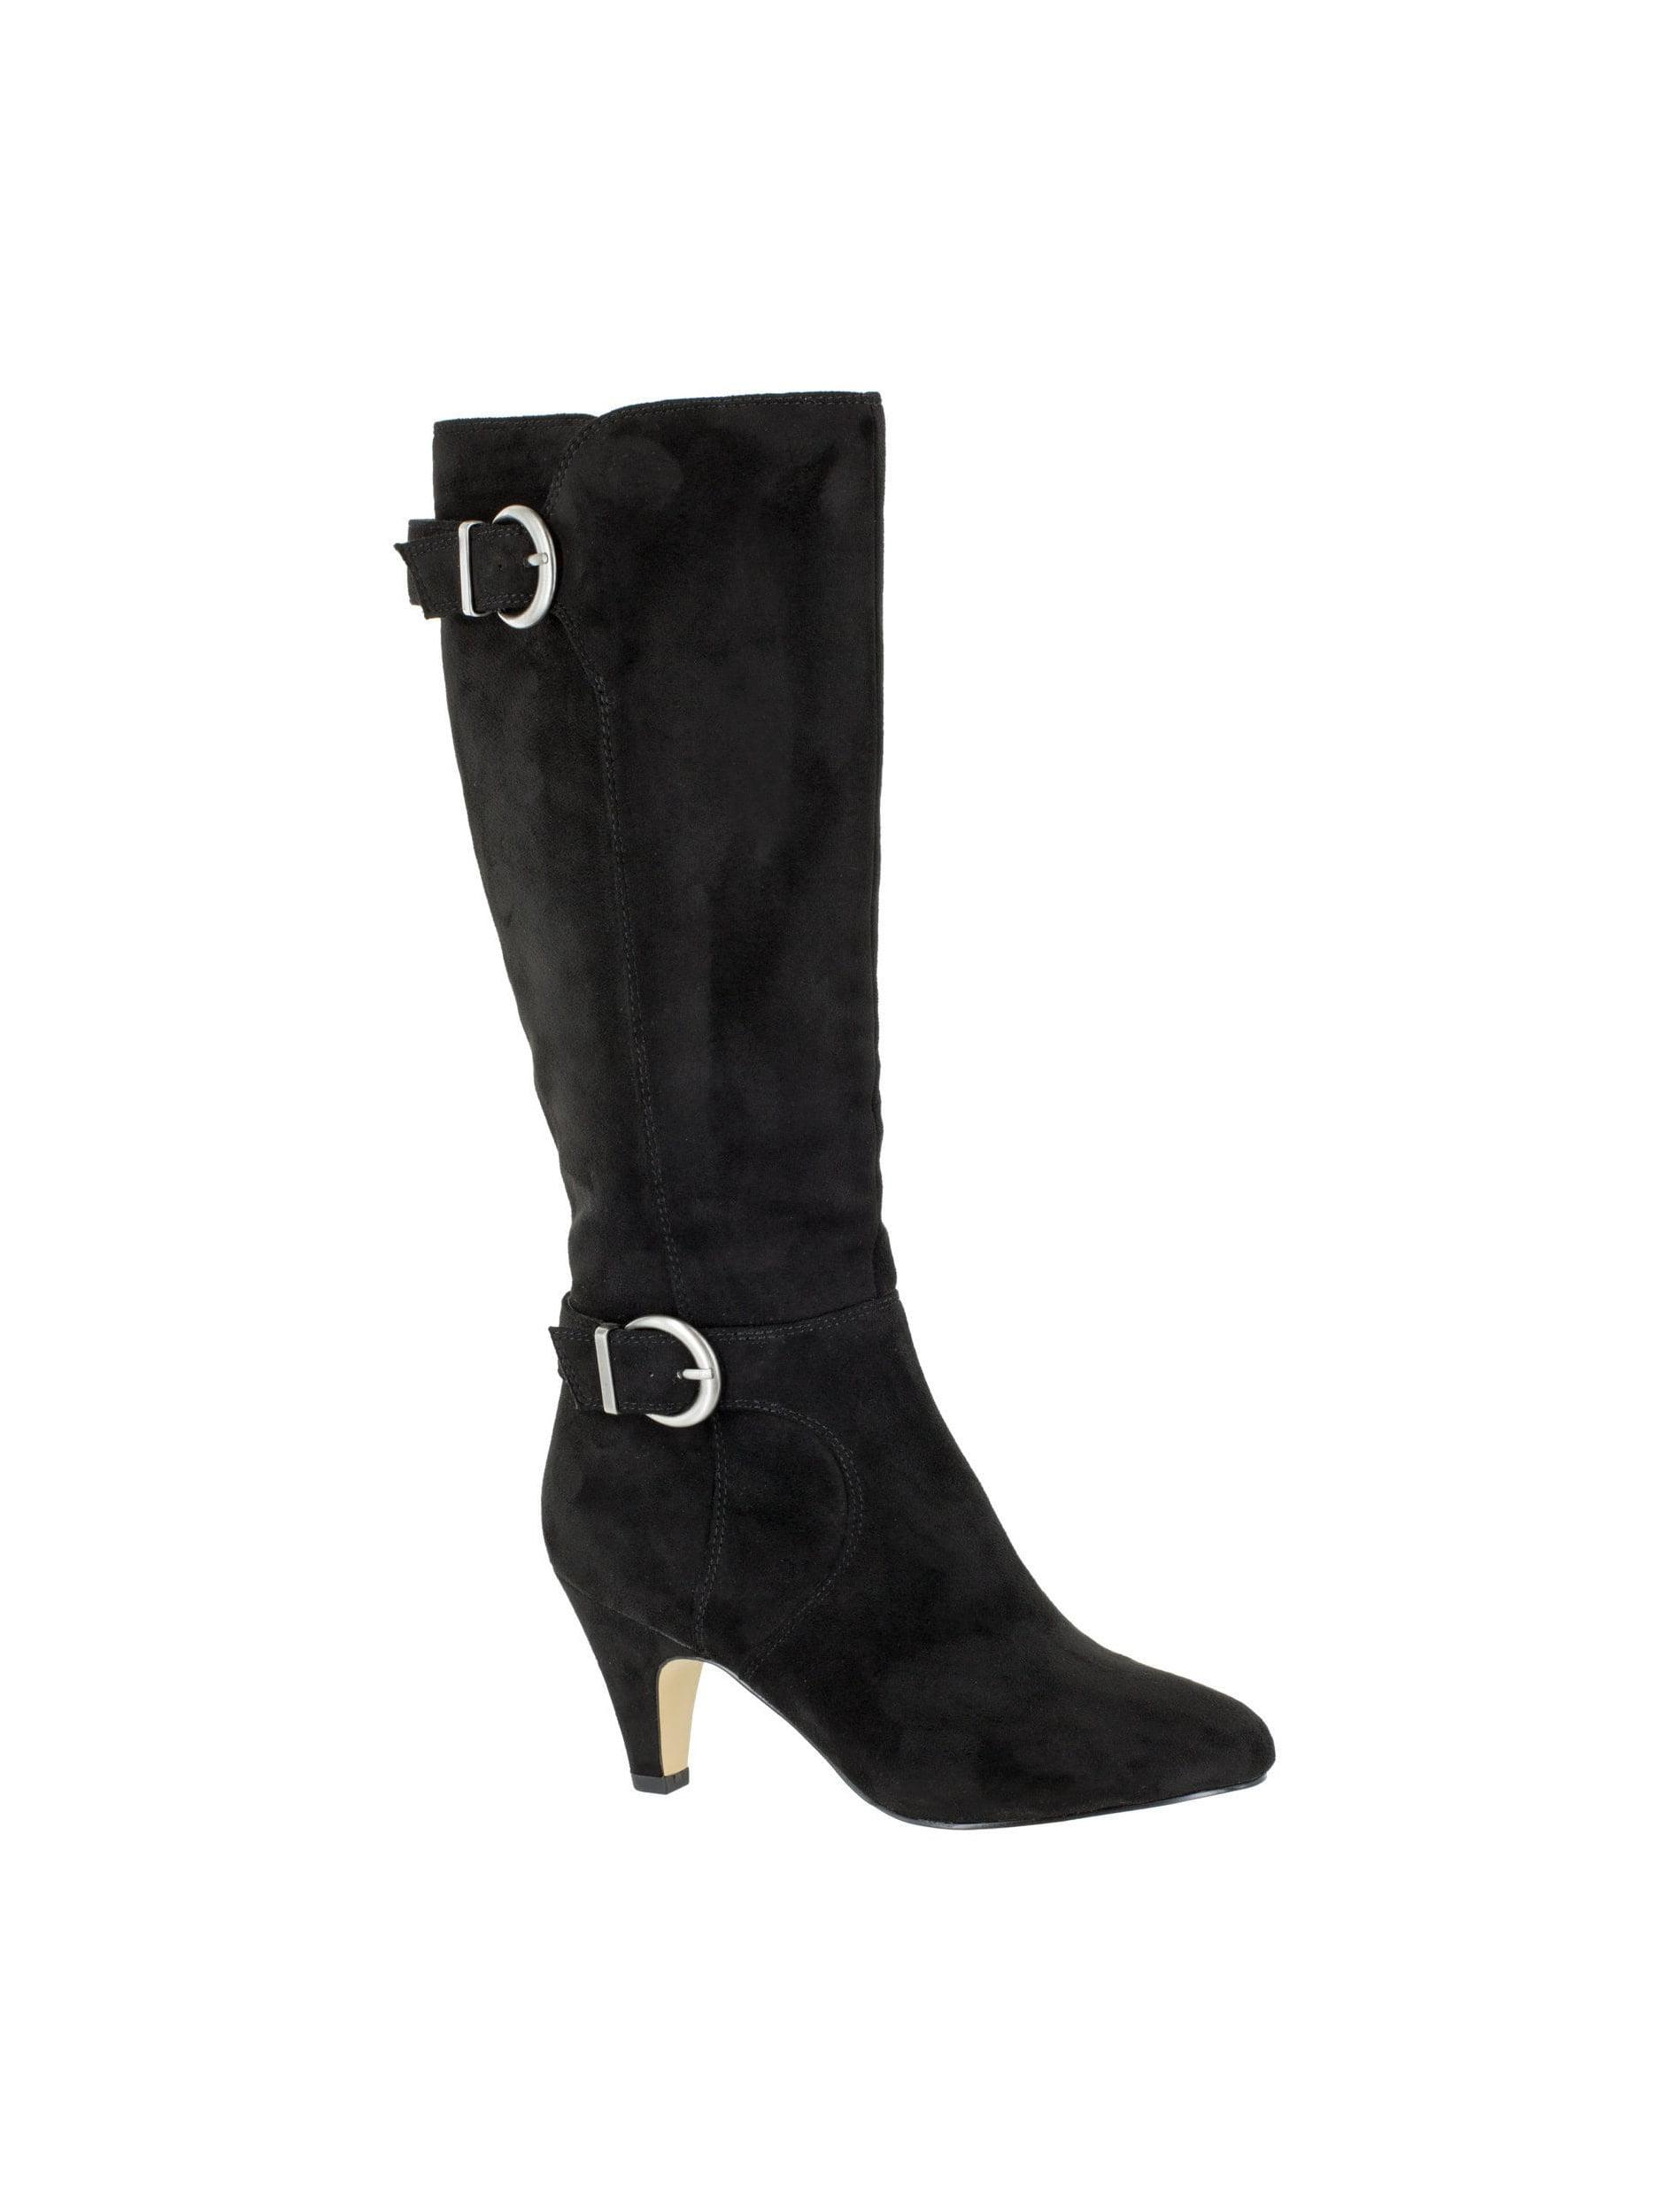 Bella Vita  Women's Toni II Black Suede Tall Boots